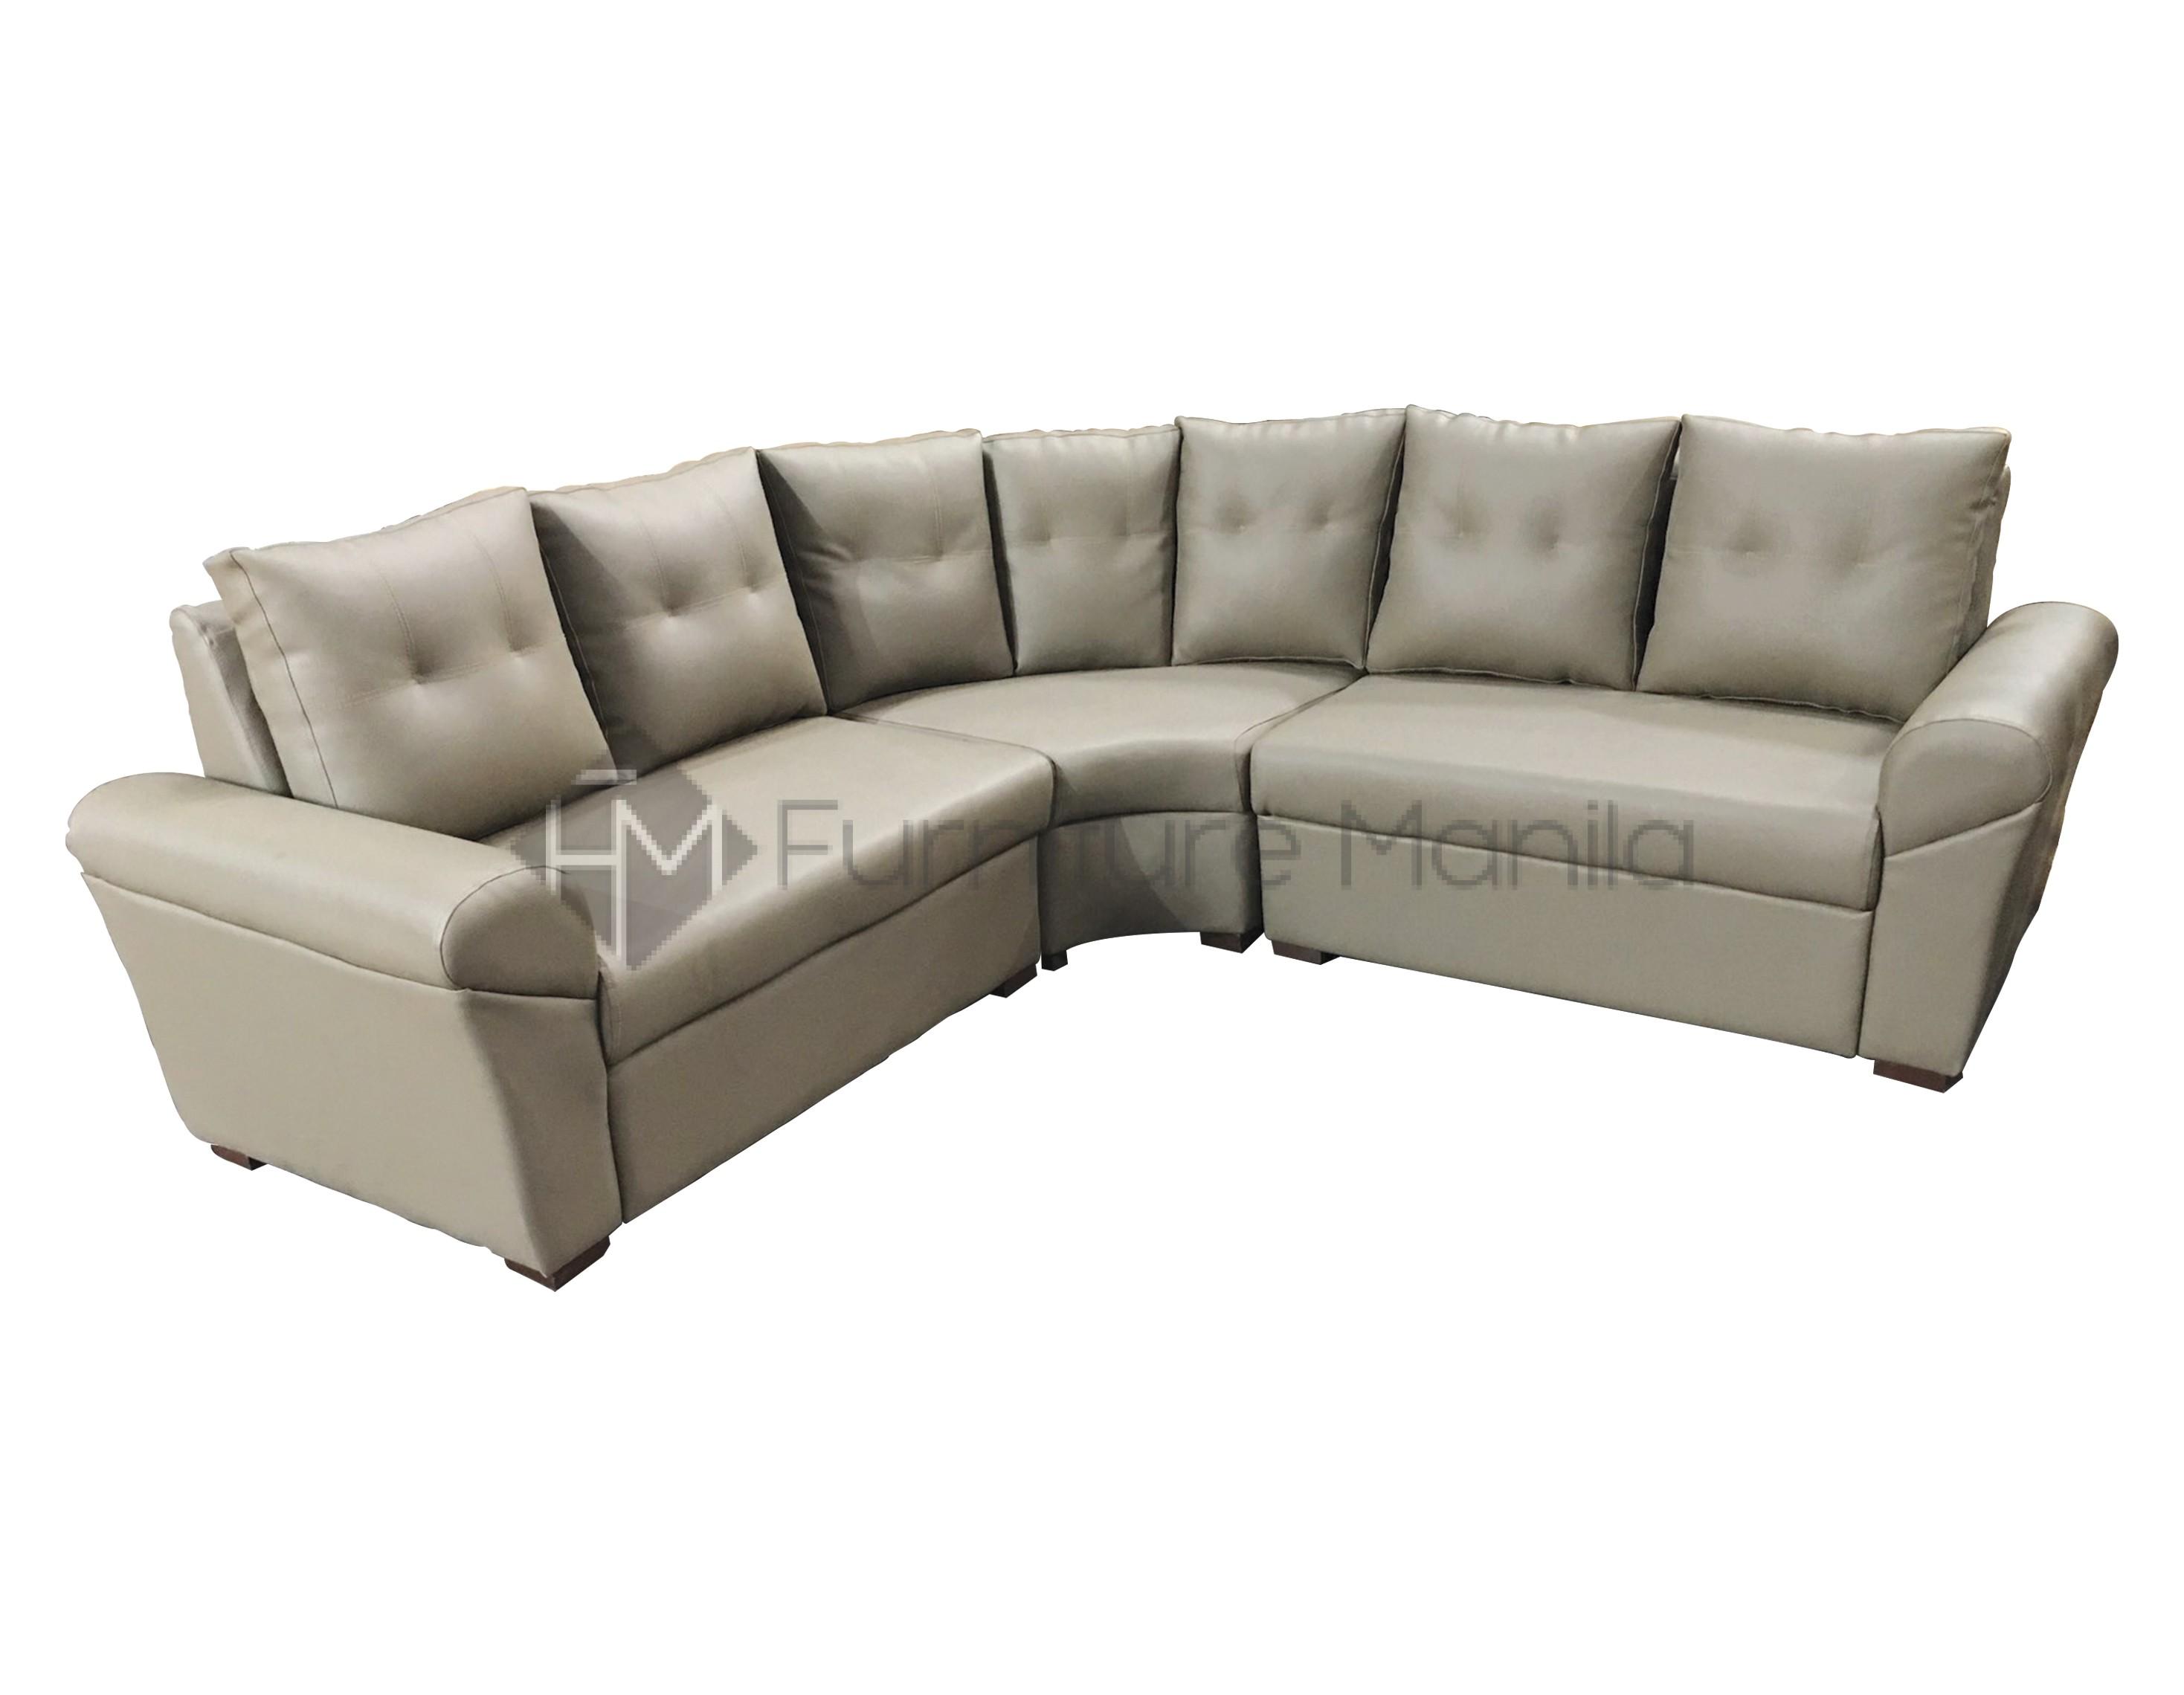 Phenomenal Eub305 Corner Sofa Ibusinesslaw Wood Chair Design Ideas Ibusinesslaworg